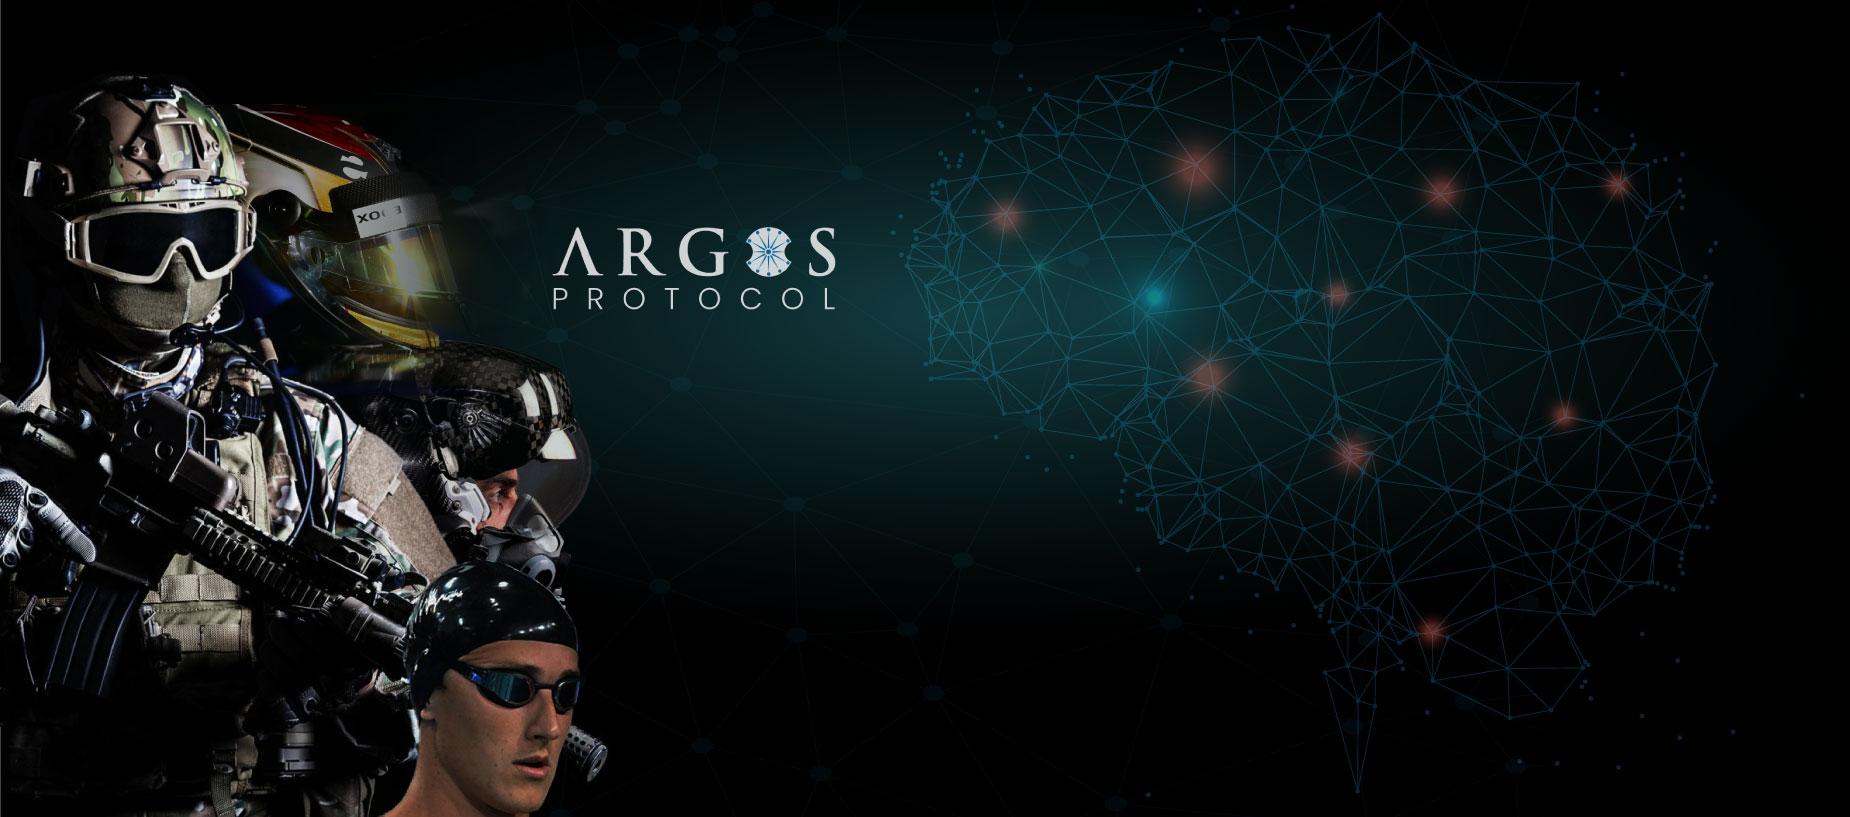 Argos Protocol TEM Performance